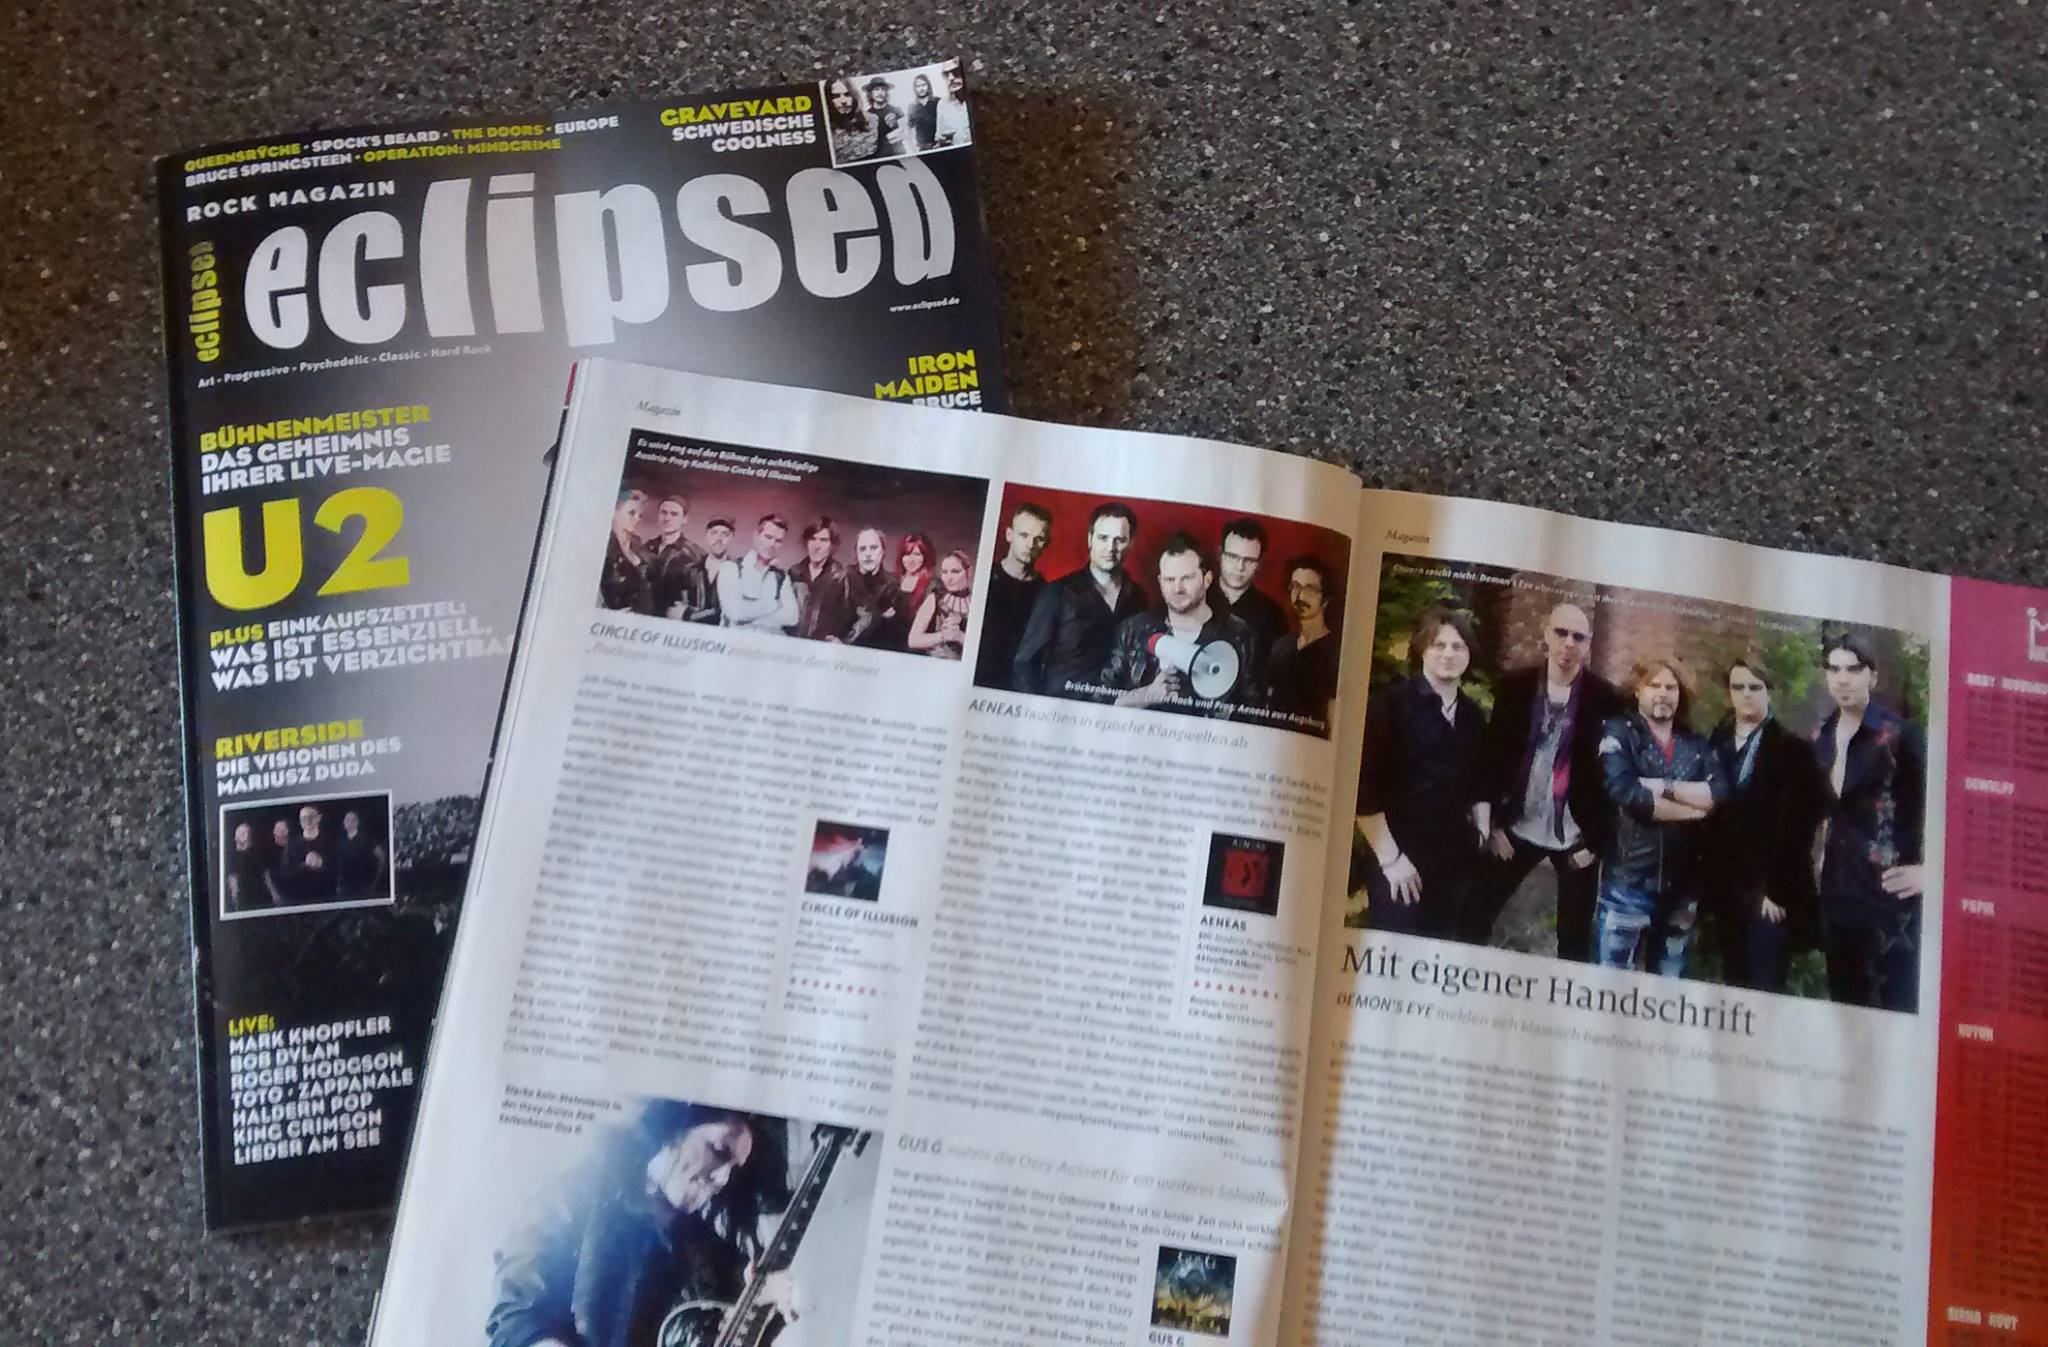 New Renaissance im Musikmagazin Eclipsed